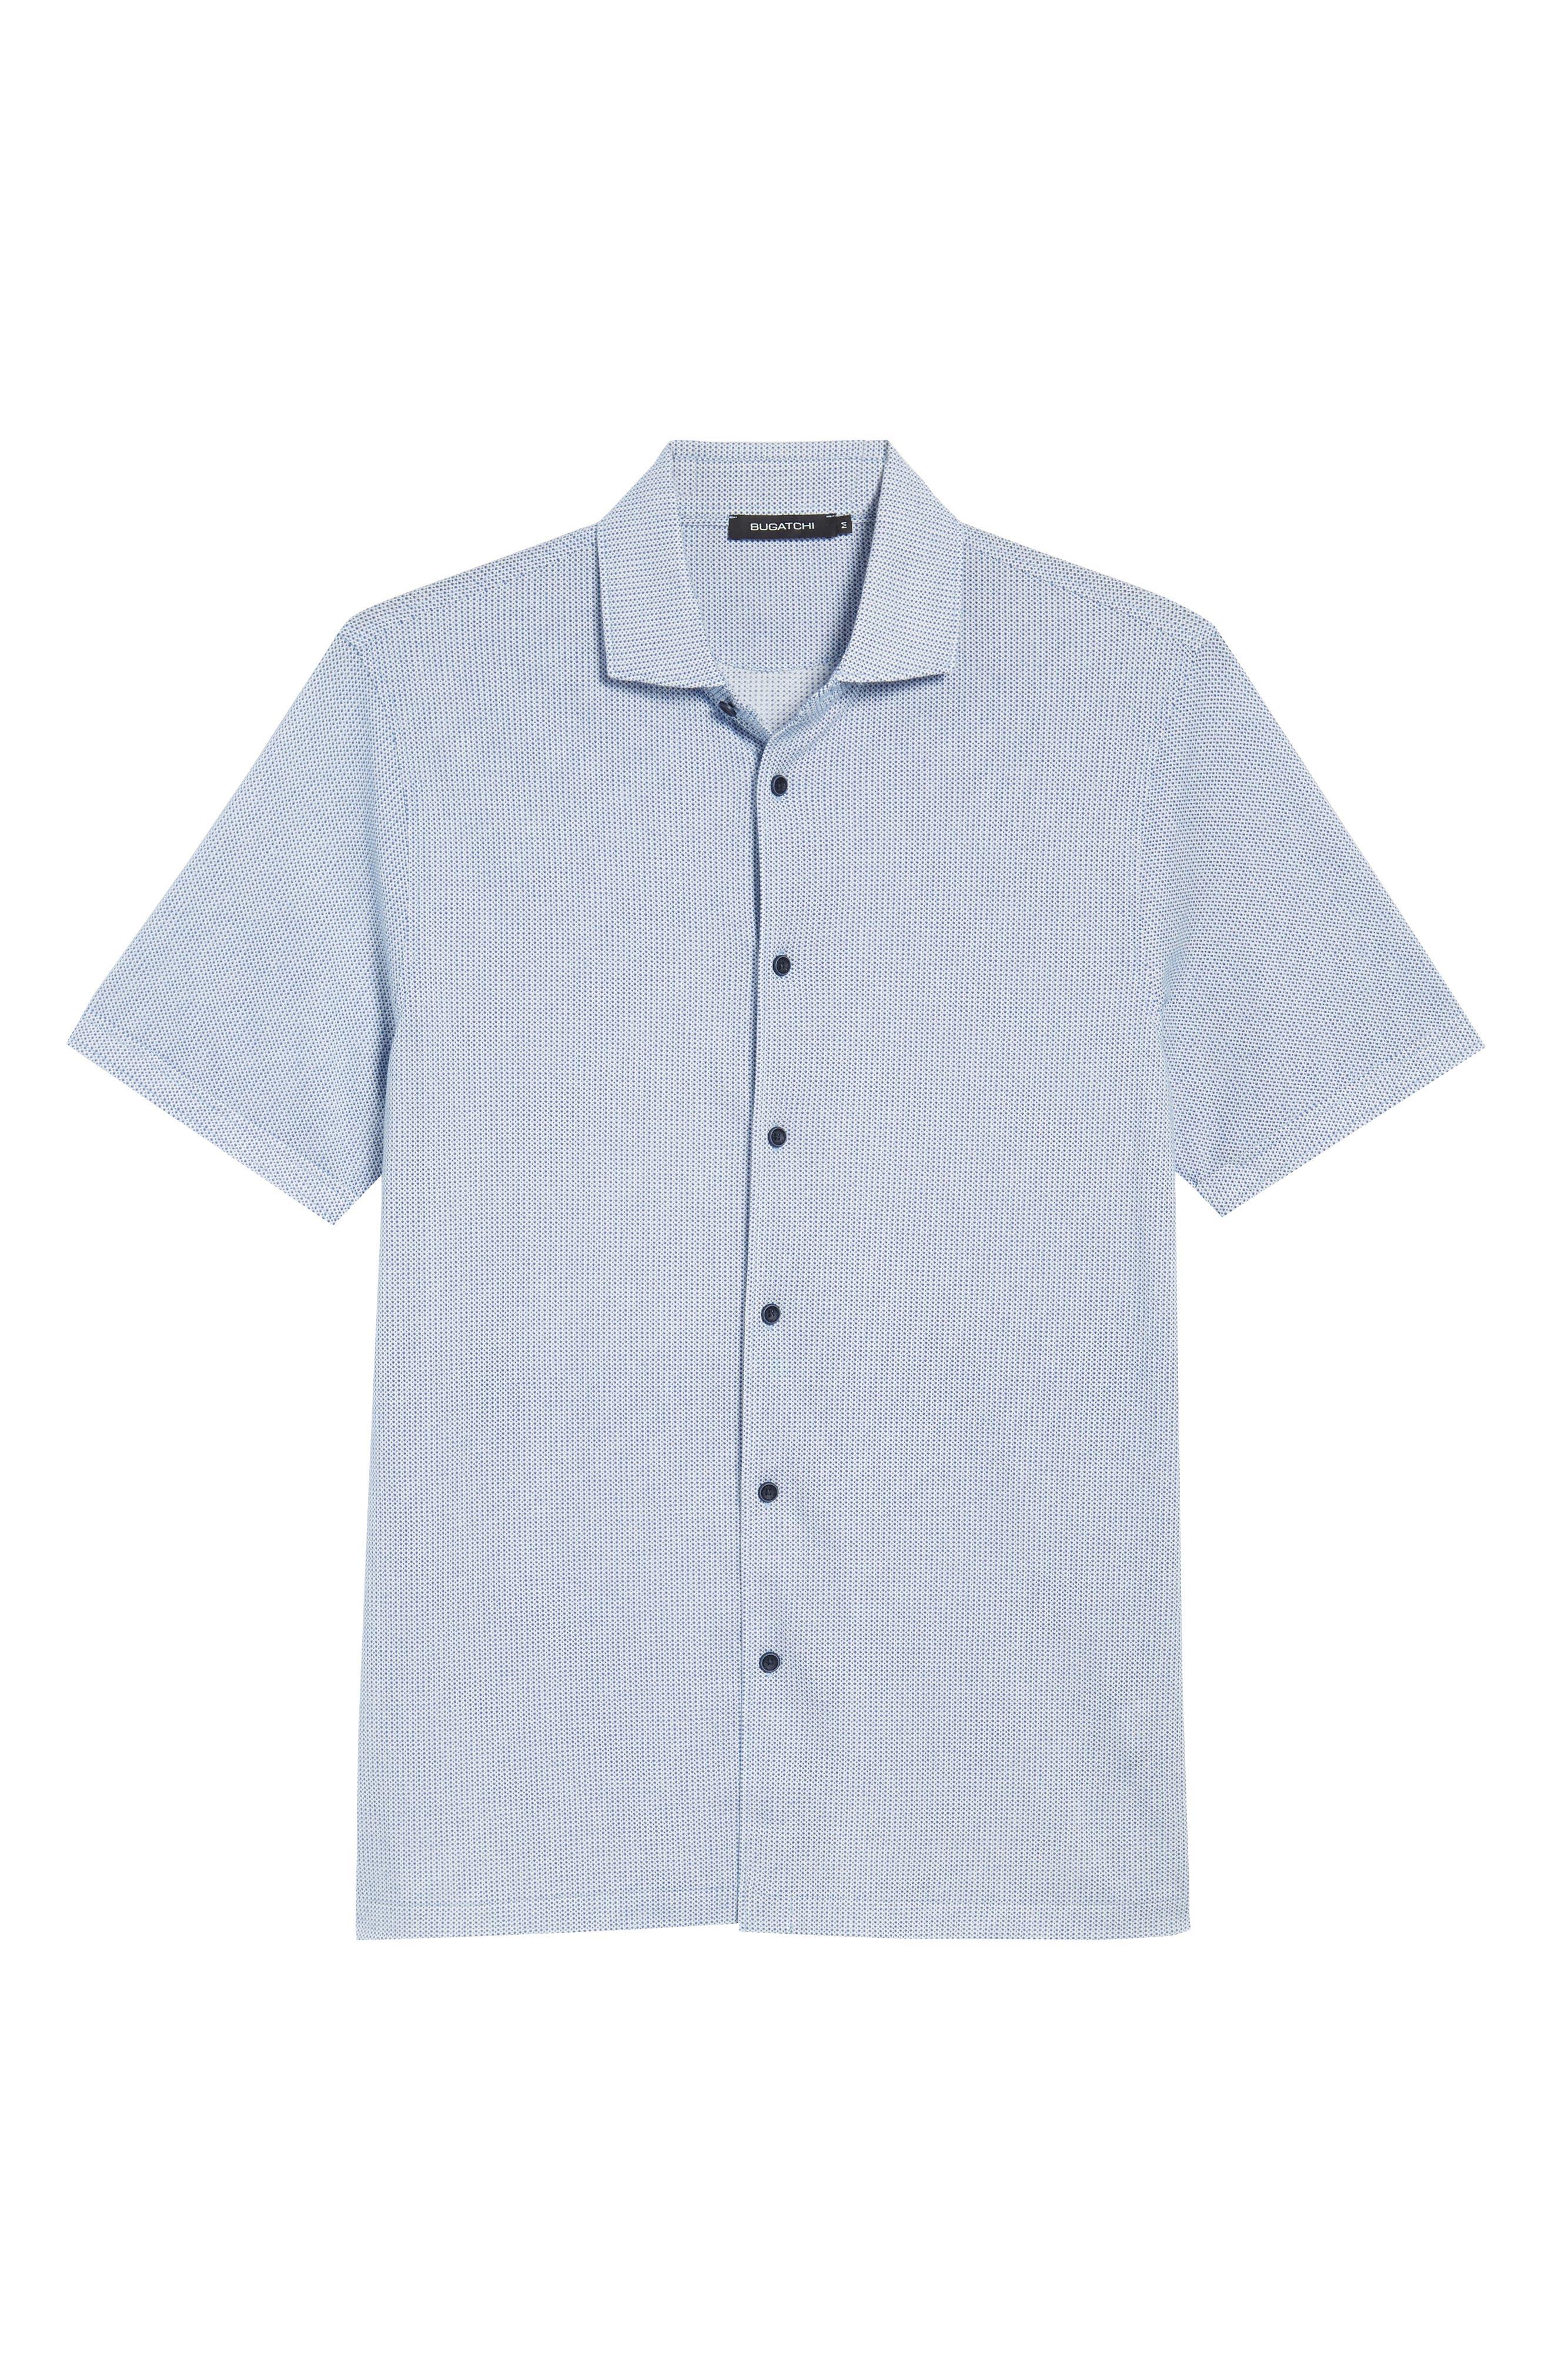 BUGATCHI,                             Shaped Fit Microprint Sport Shirt,                             Alternate thumbnail 6, color,                             CLASSIC BLUE